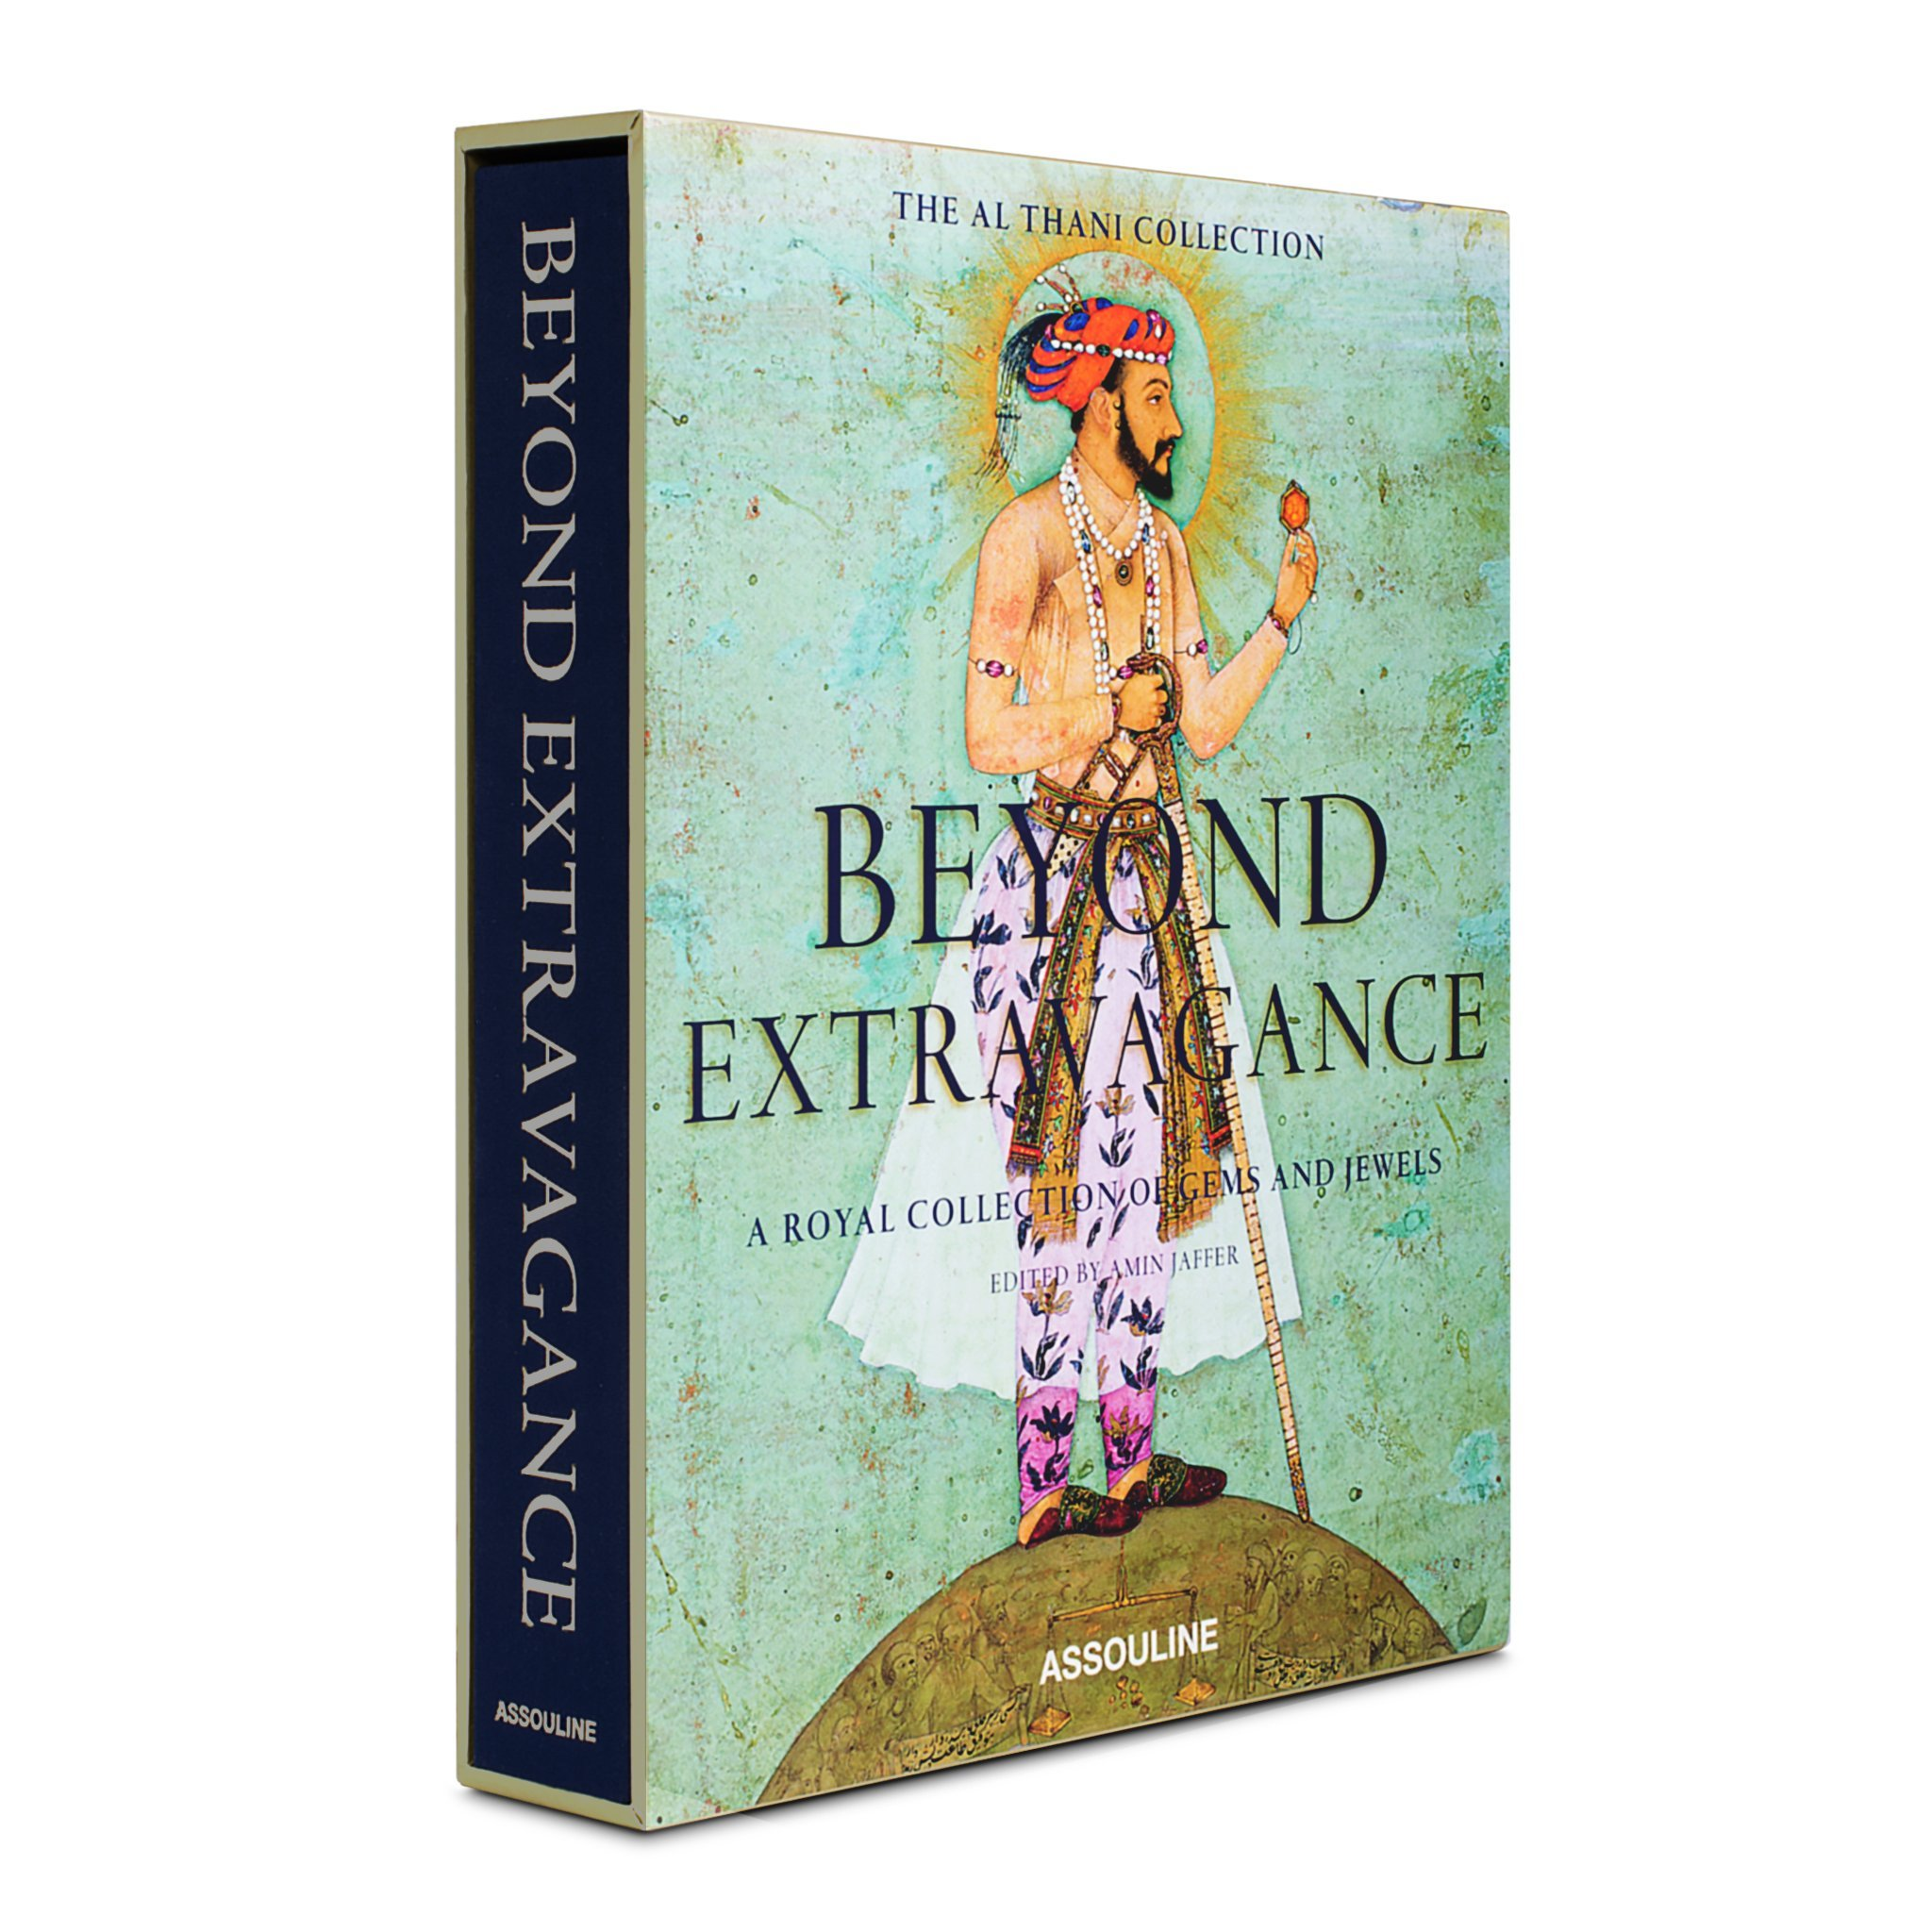 Beyond Extravagance © Assouline